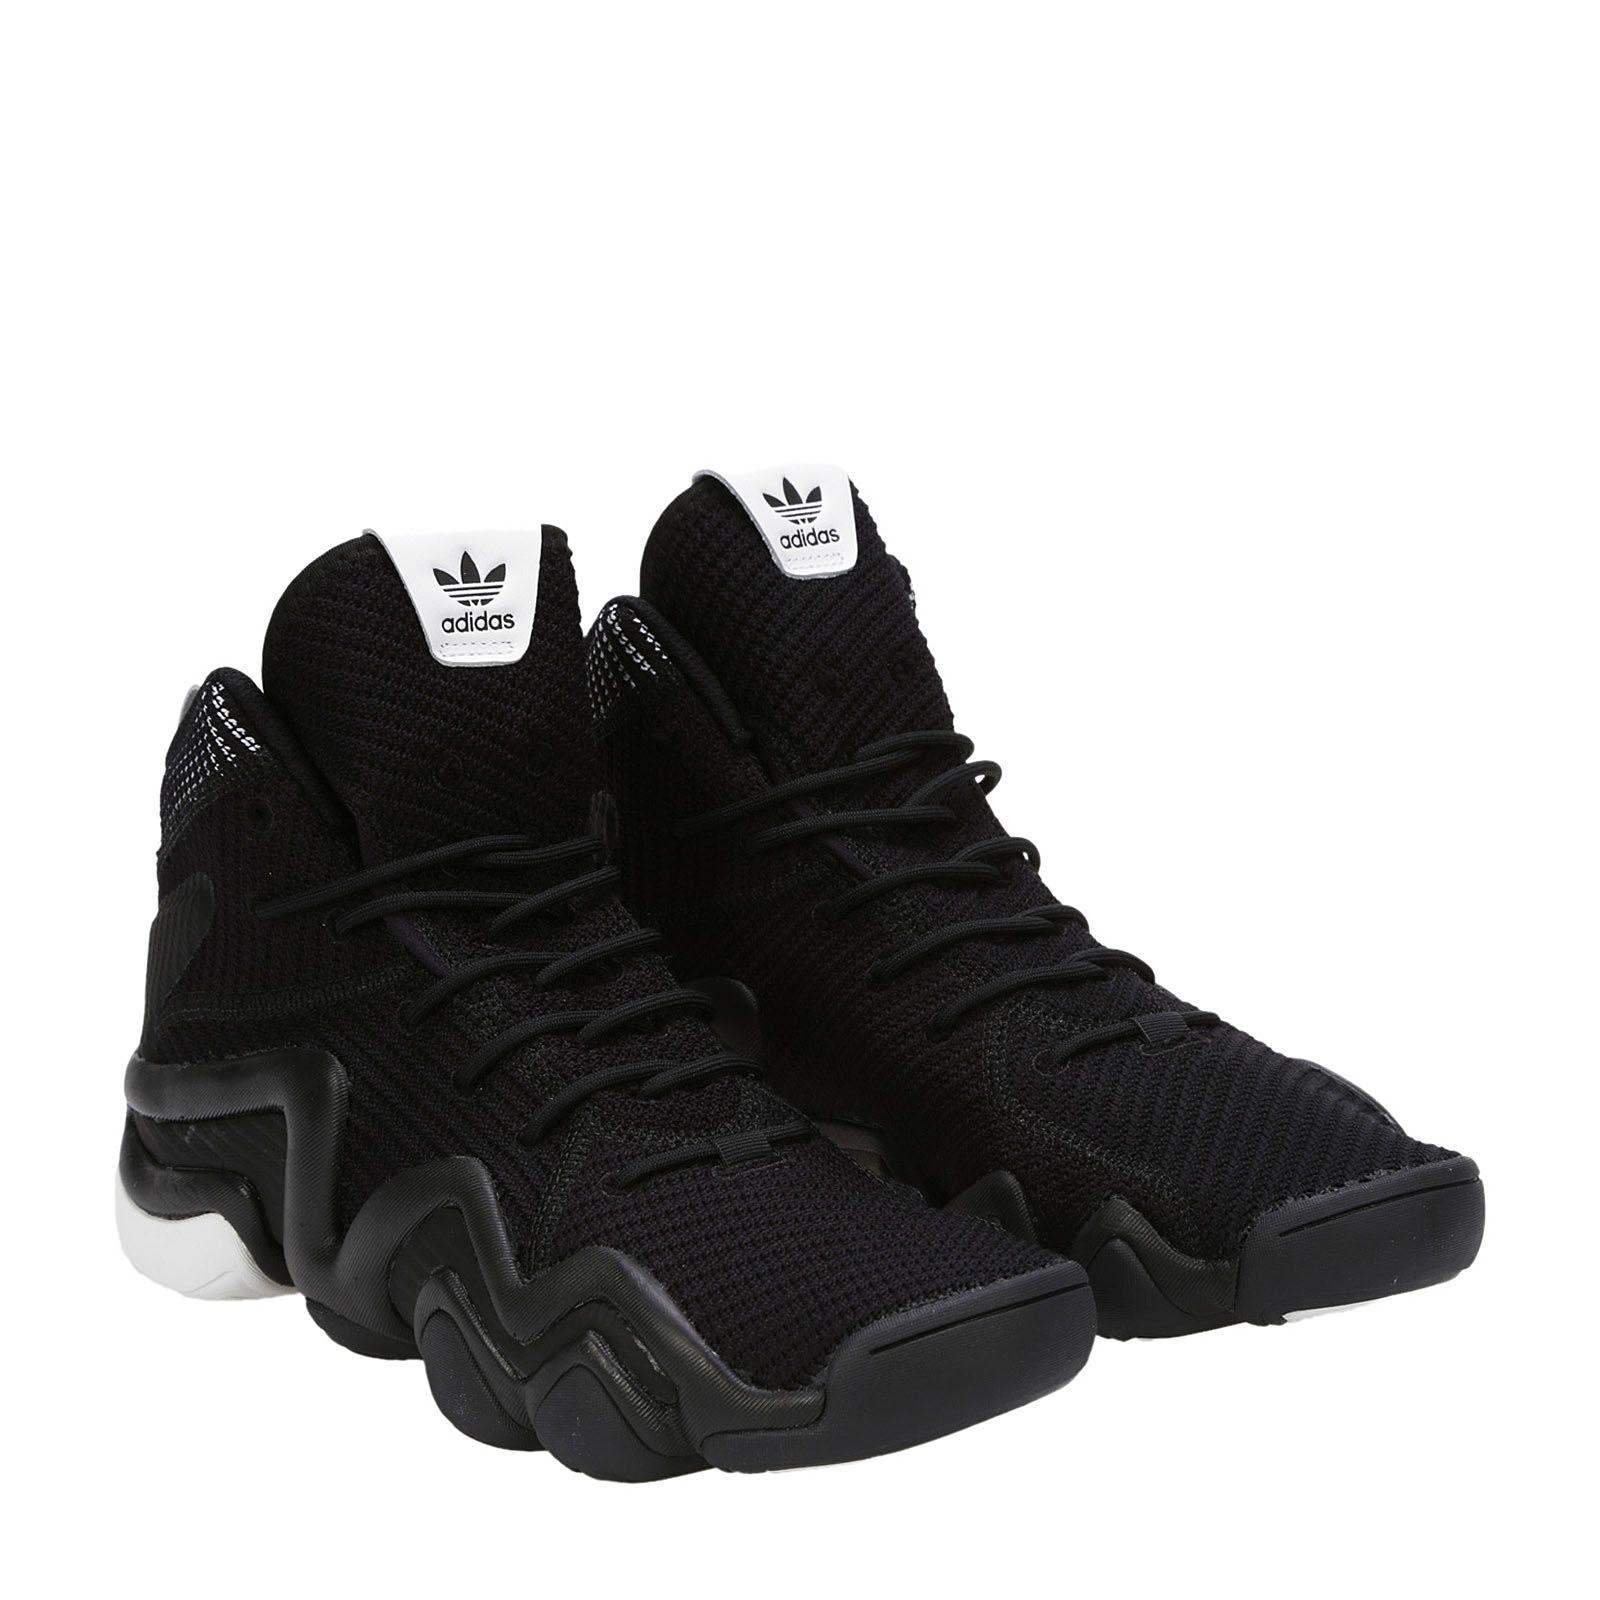 Adidas Originals Crazy 8 Adv Pk Sneakers